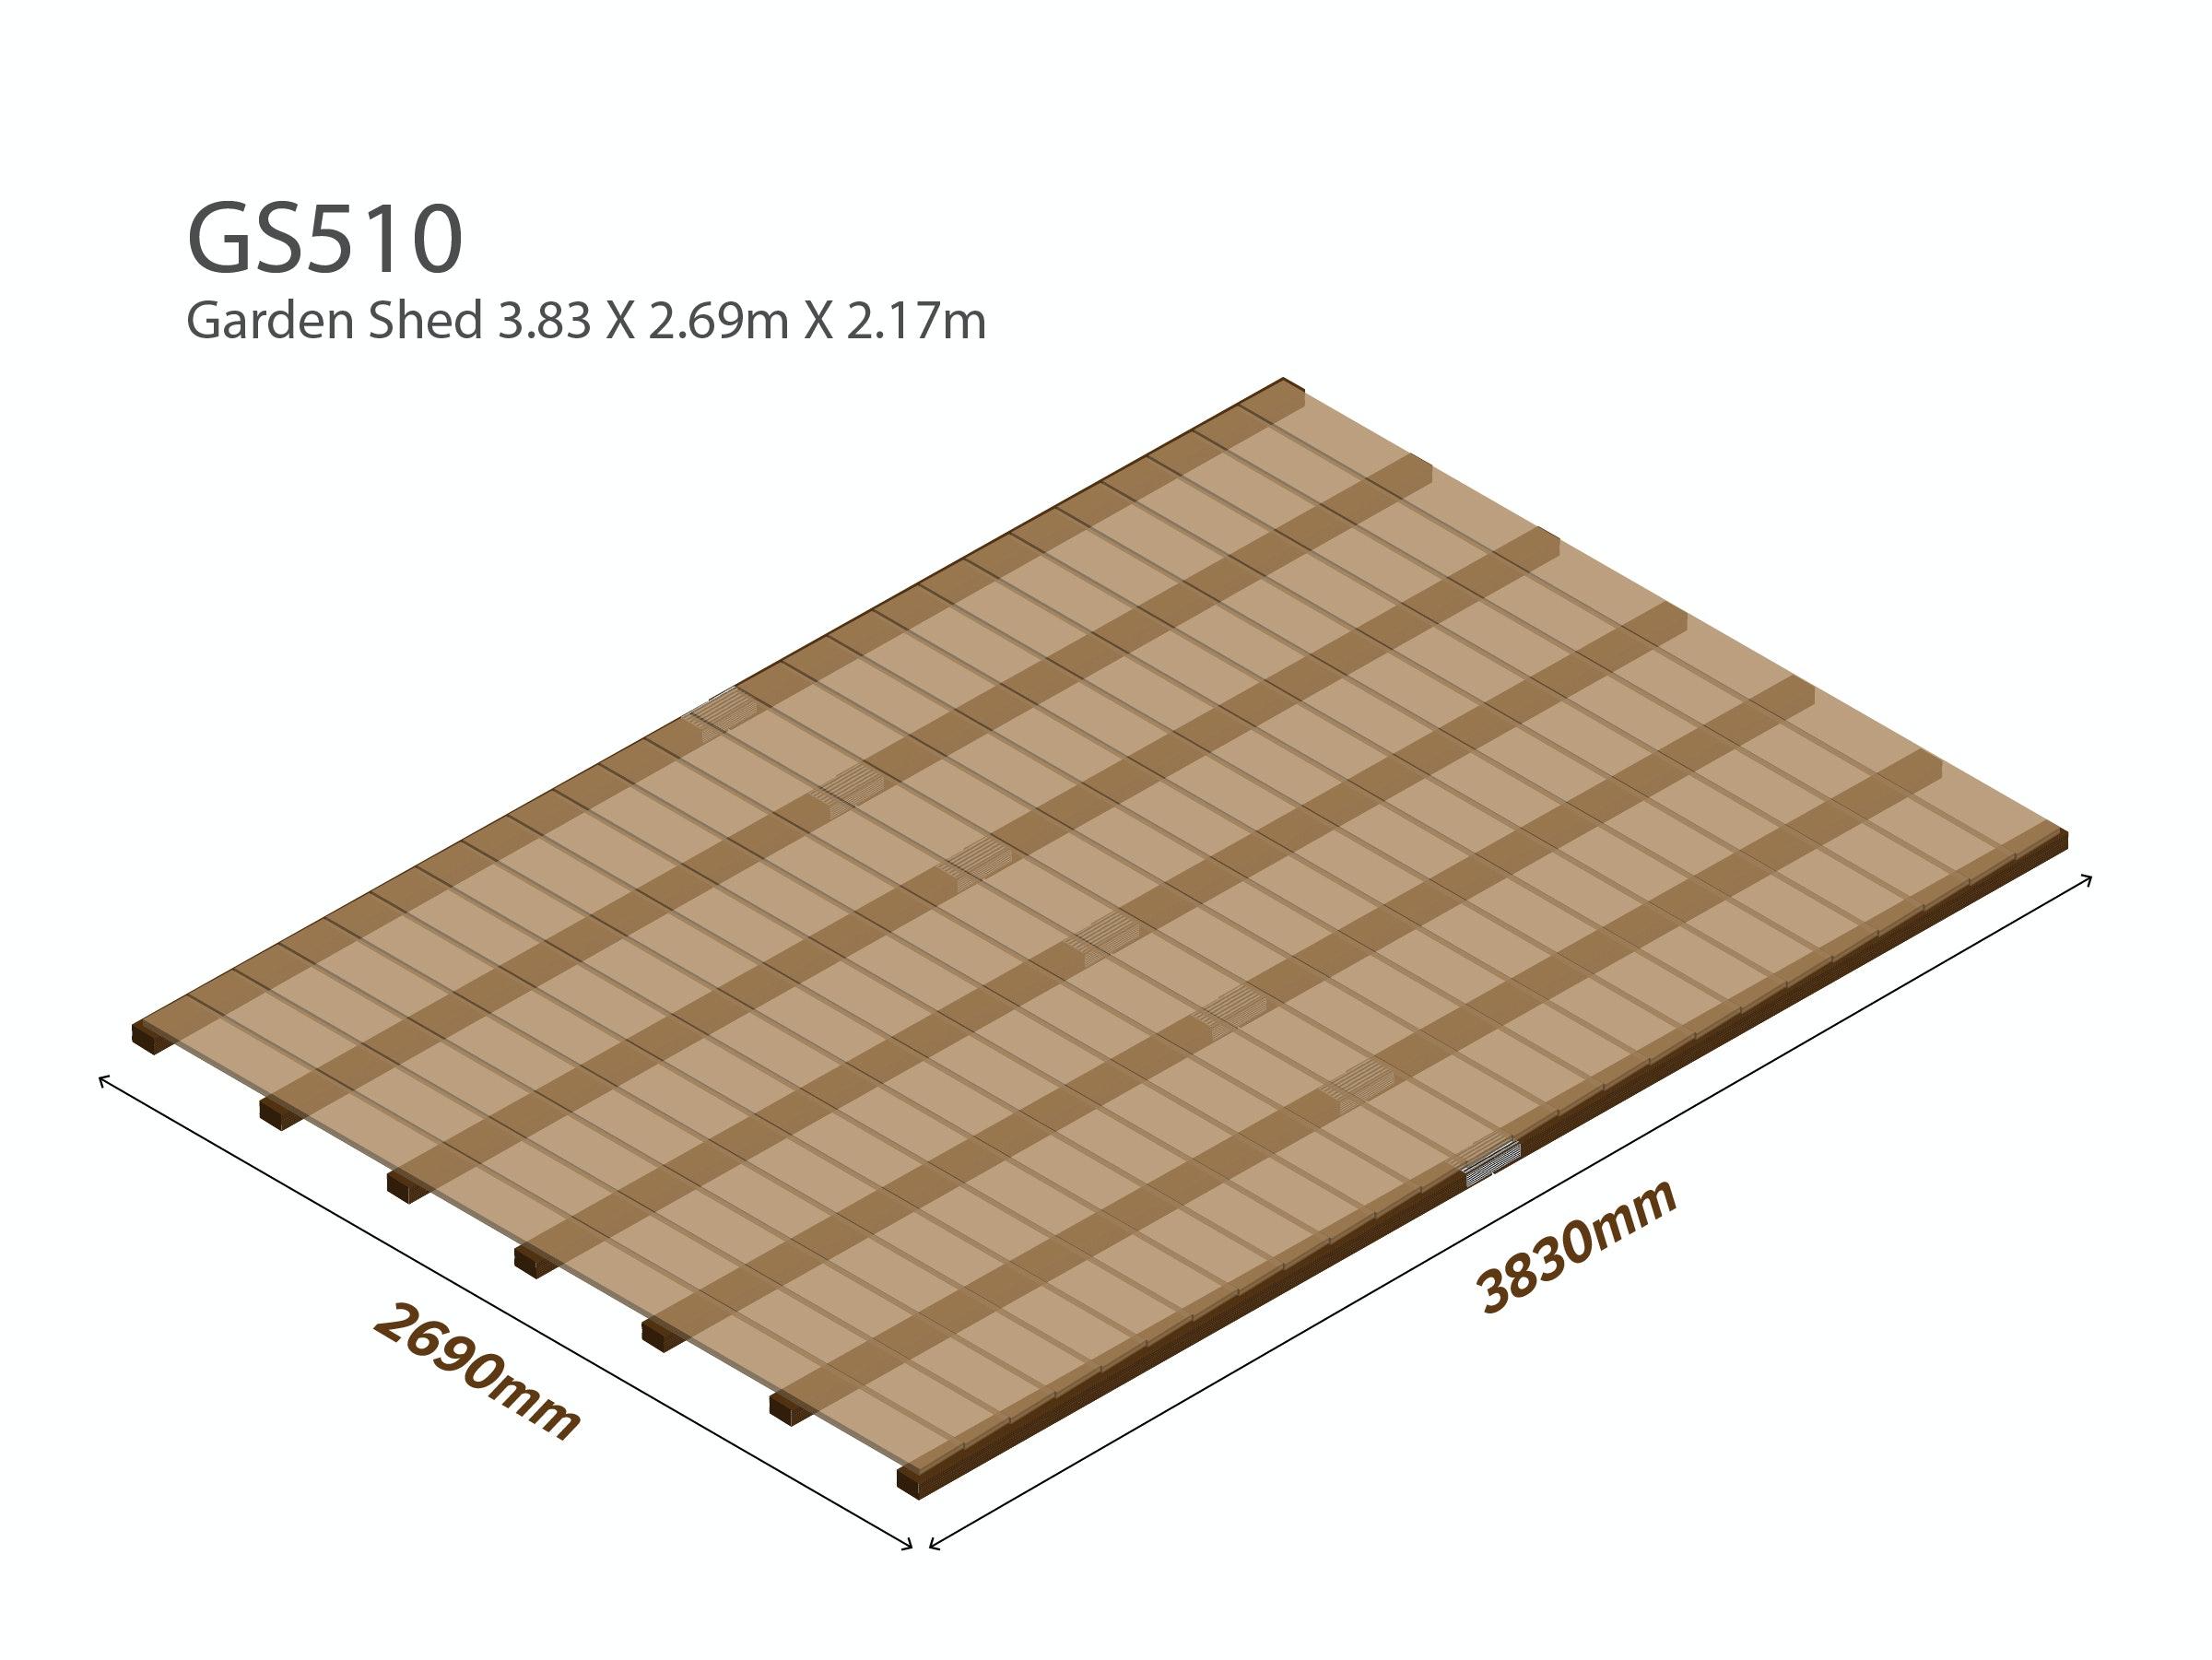 Garden Shed Wooden Floor Kit 3.83m x 2.69m